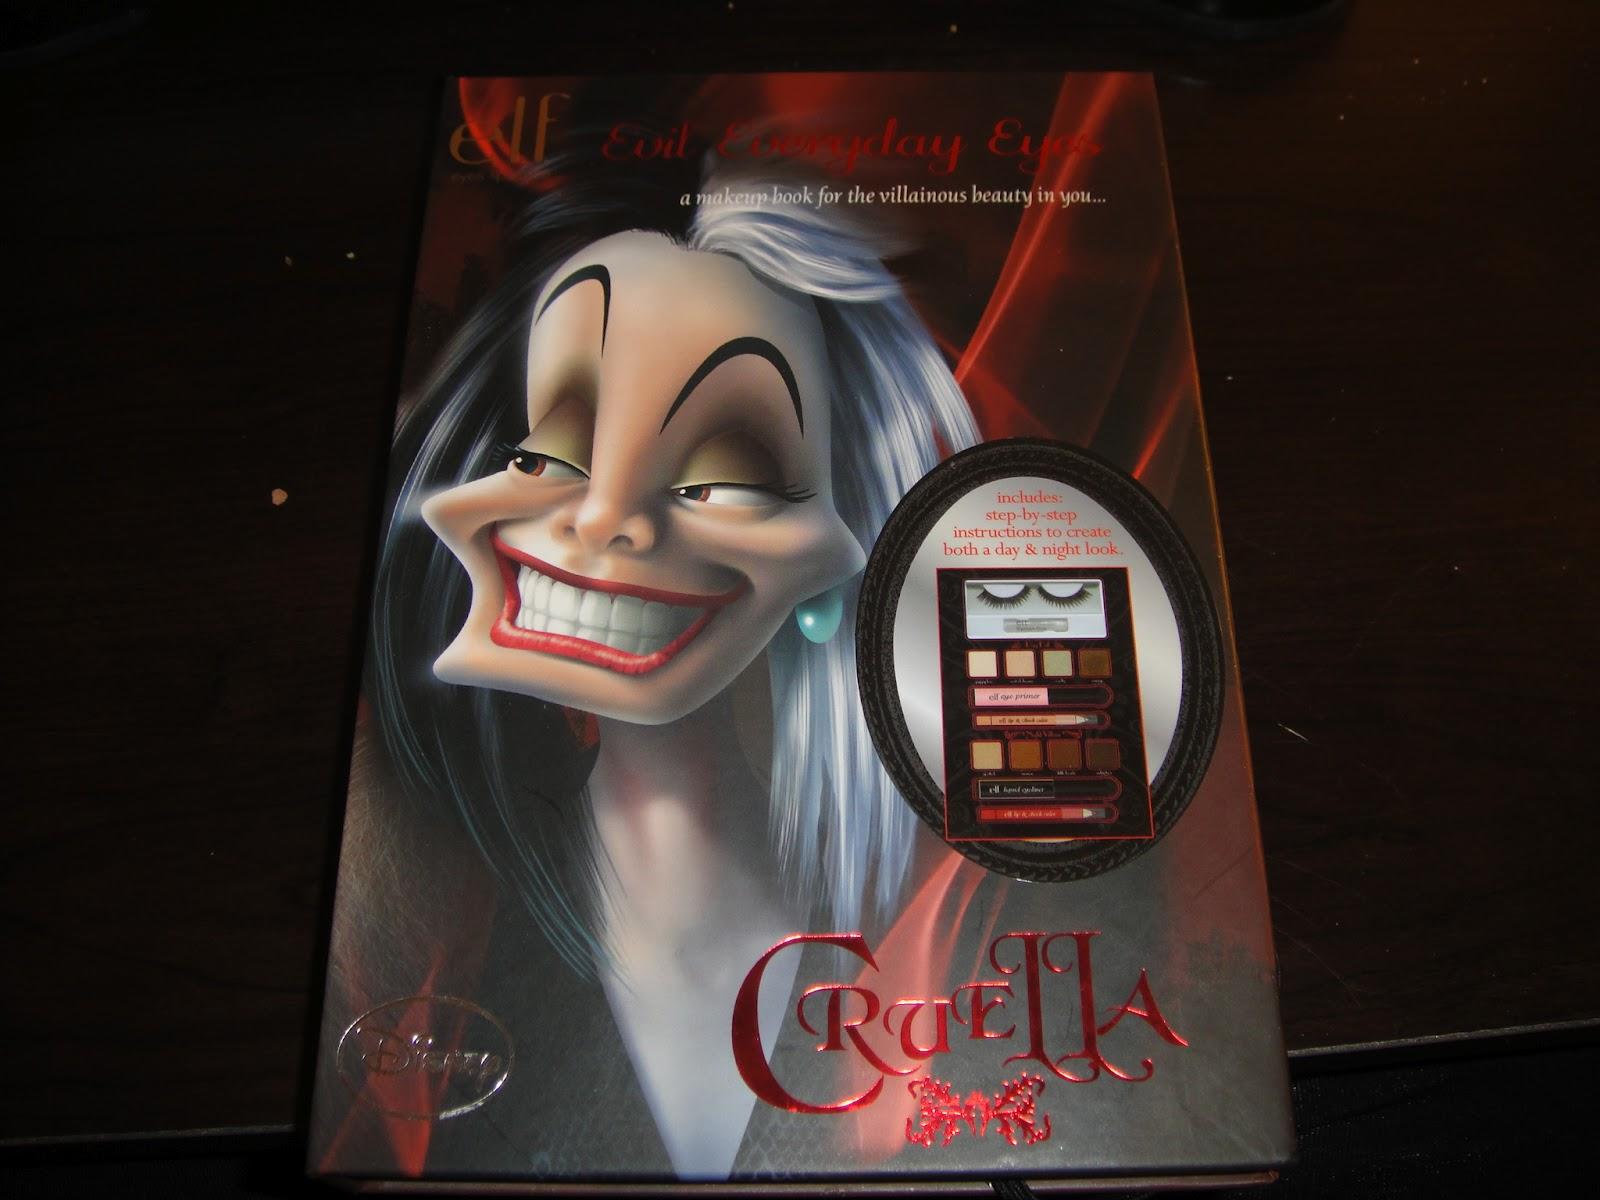 e.l.f.'s Villainous Villain: Cruella, halloween makeup, disney, villanious villains, elf, cruella, makeup kit